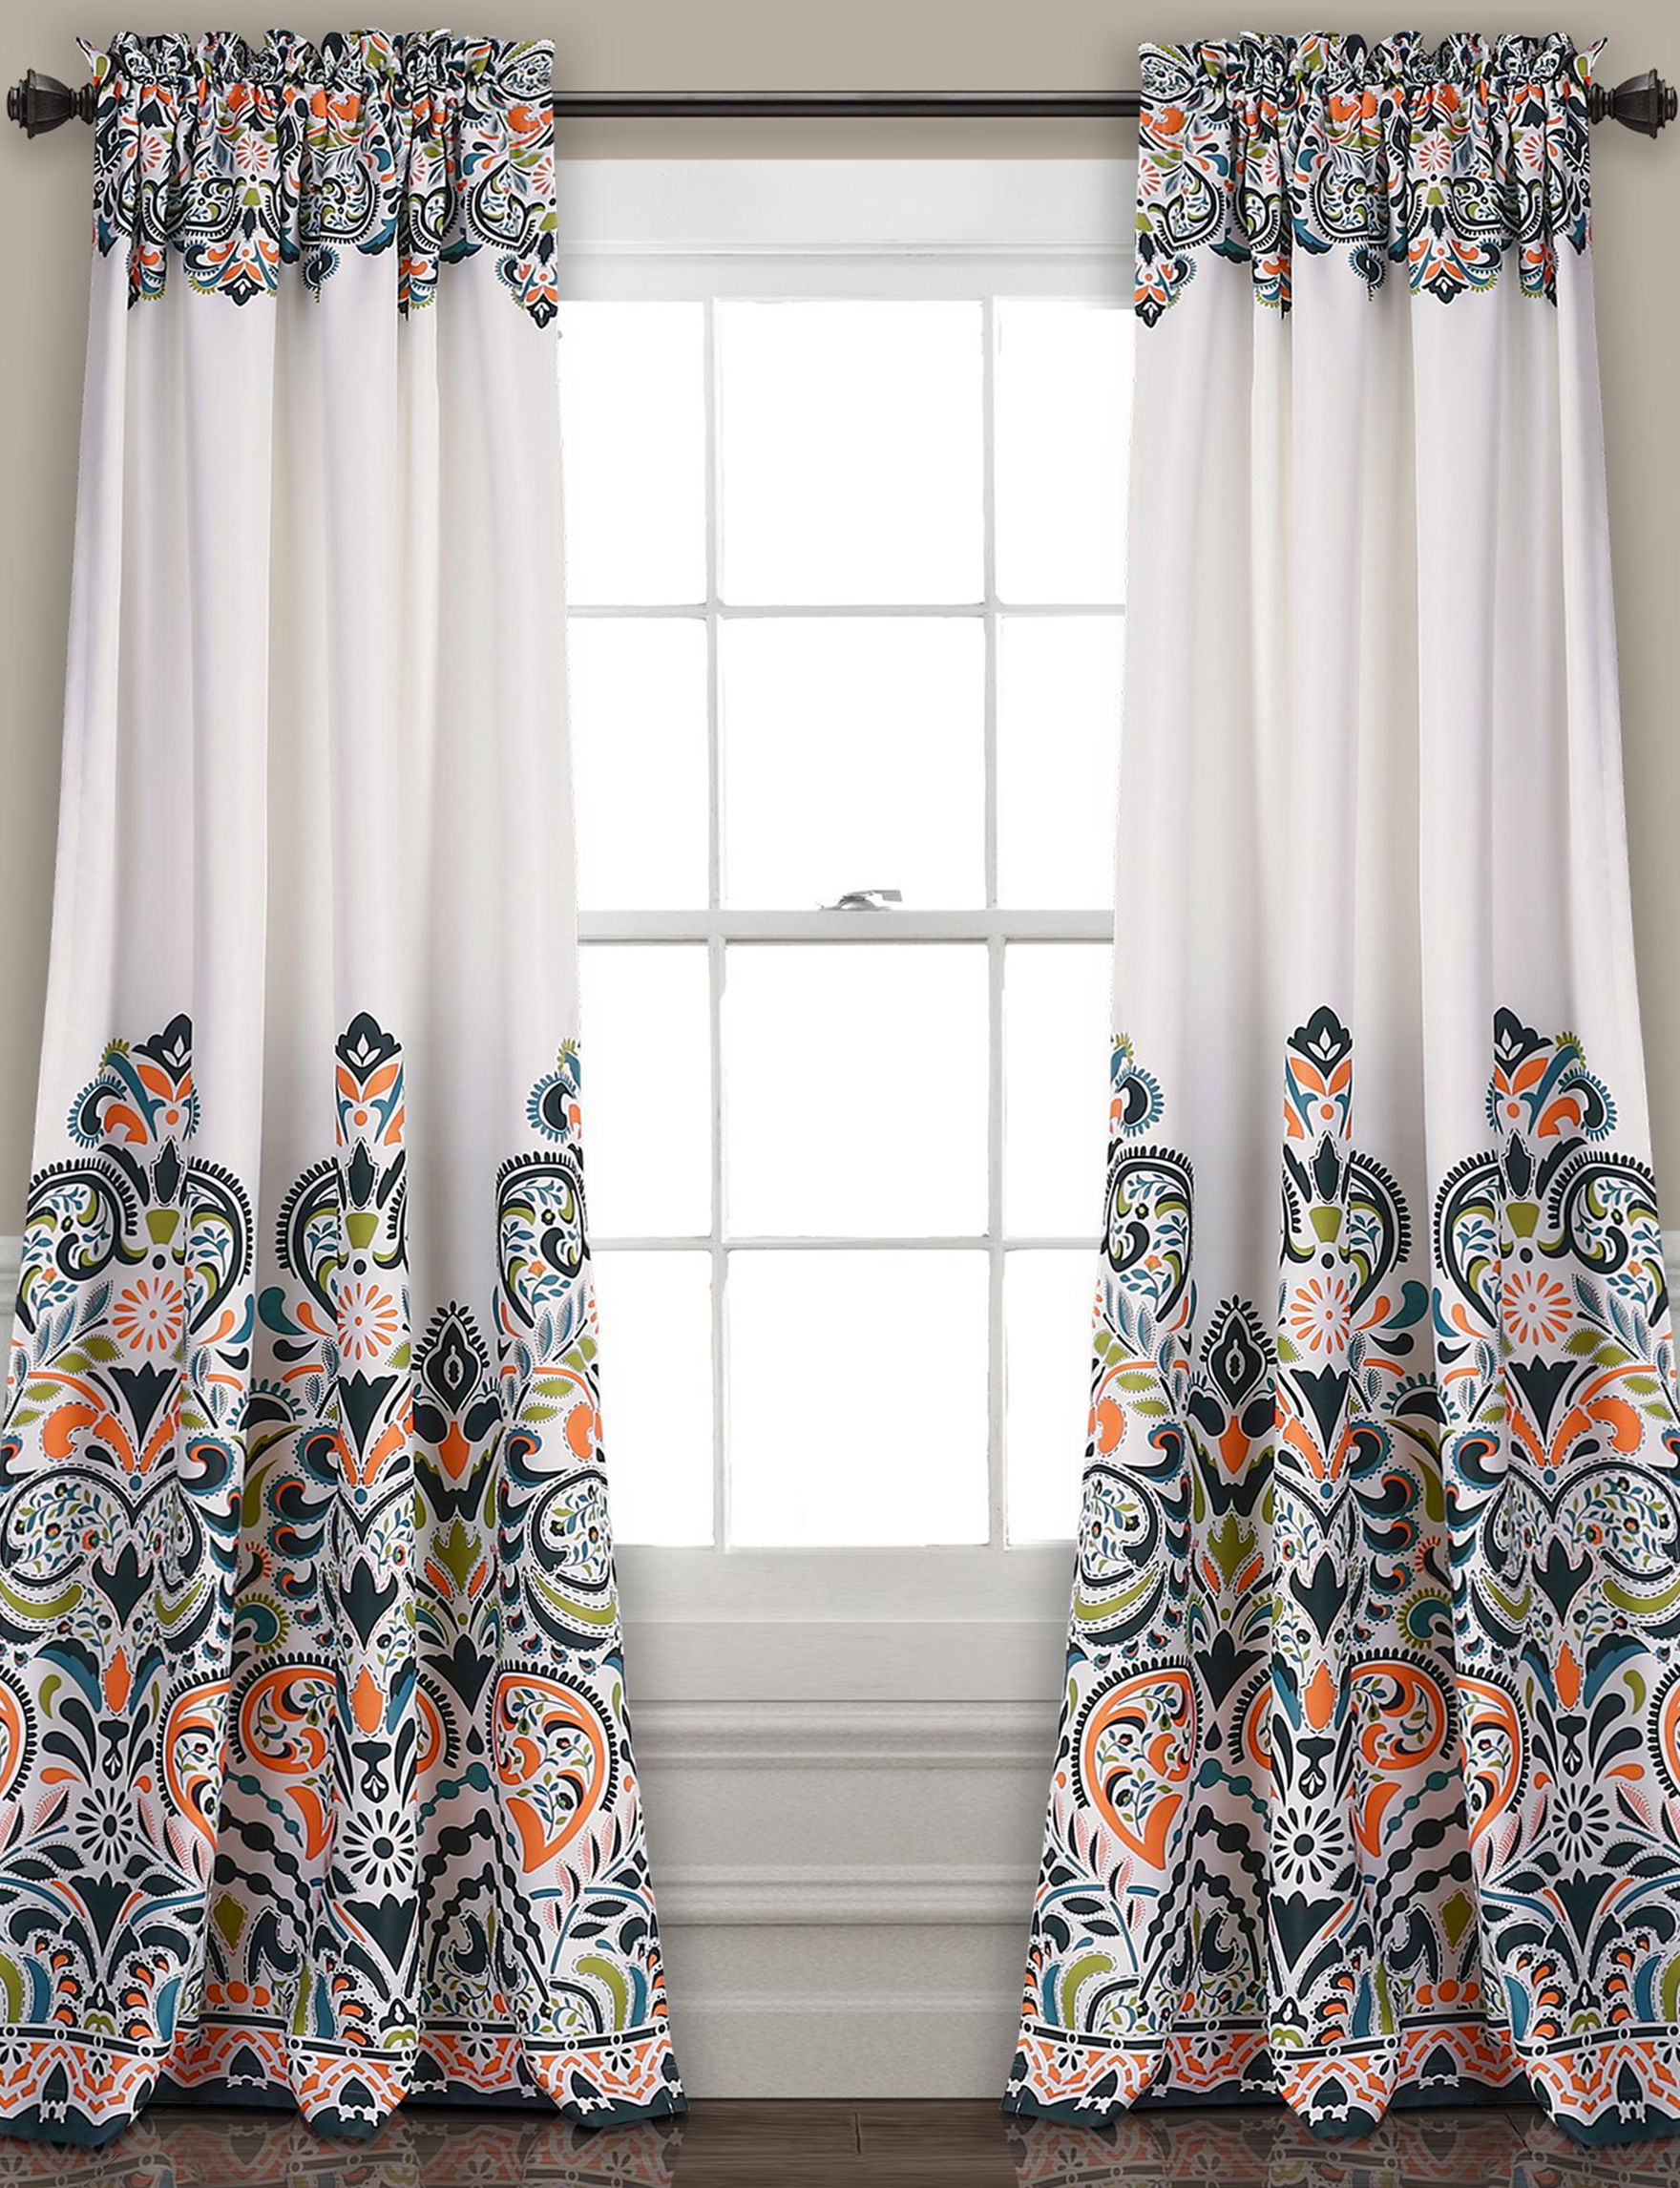 Half Moon Navy Curtains Drapes Window Treatments